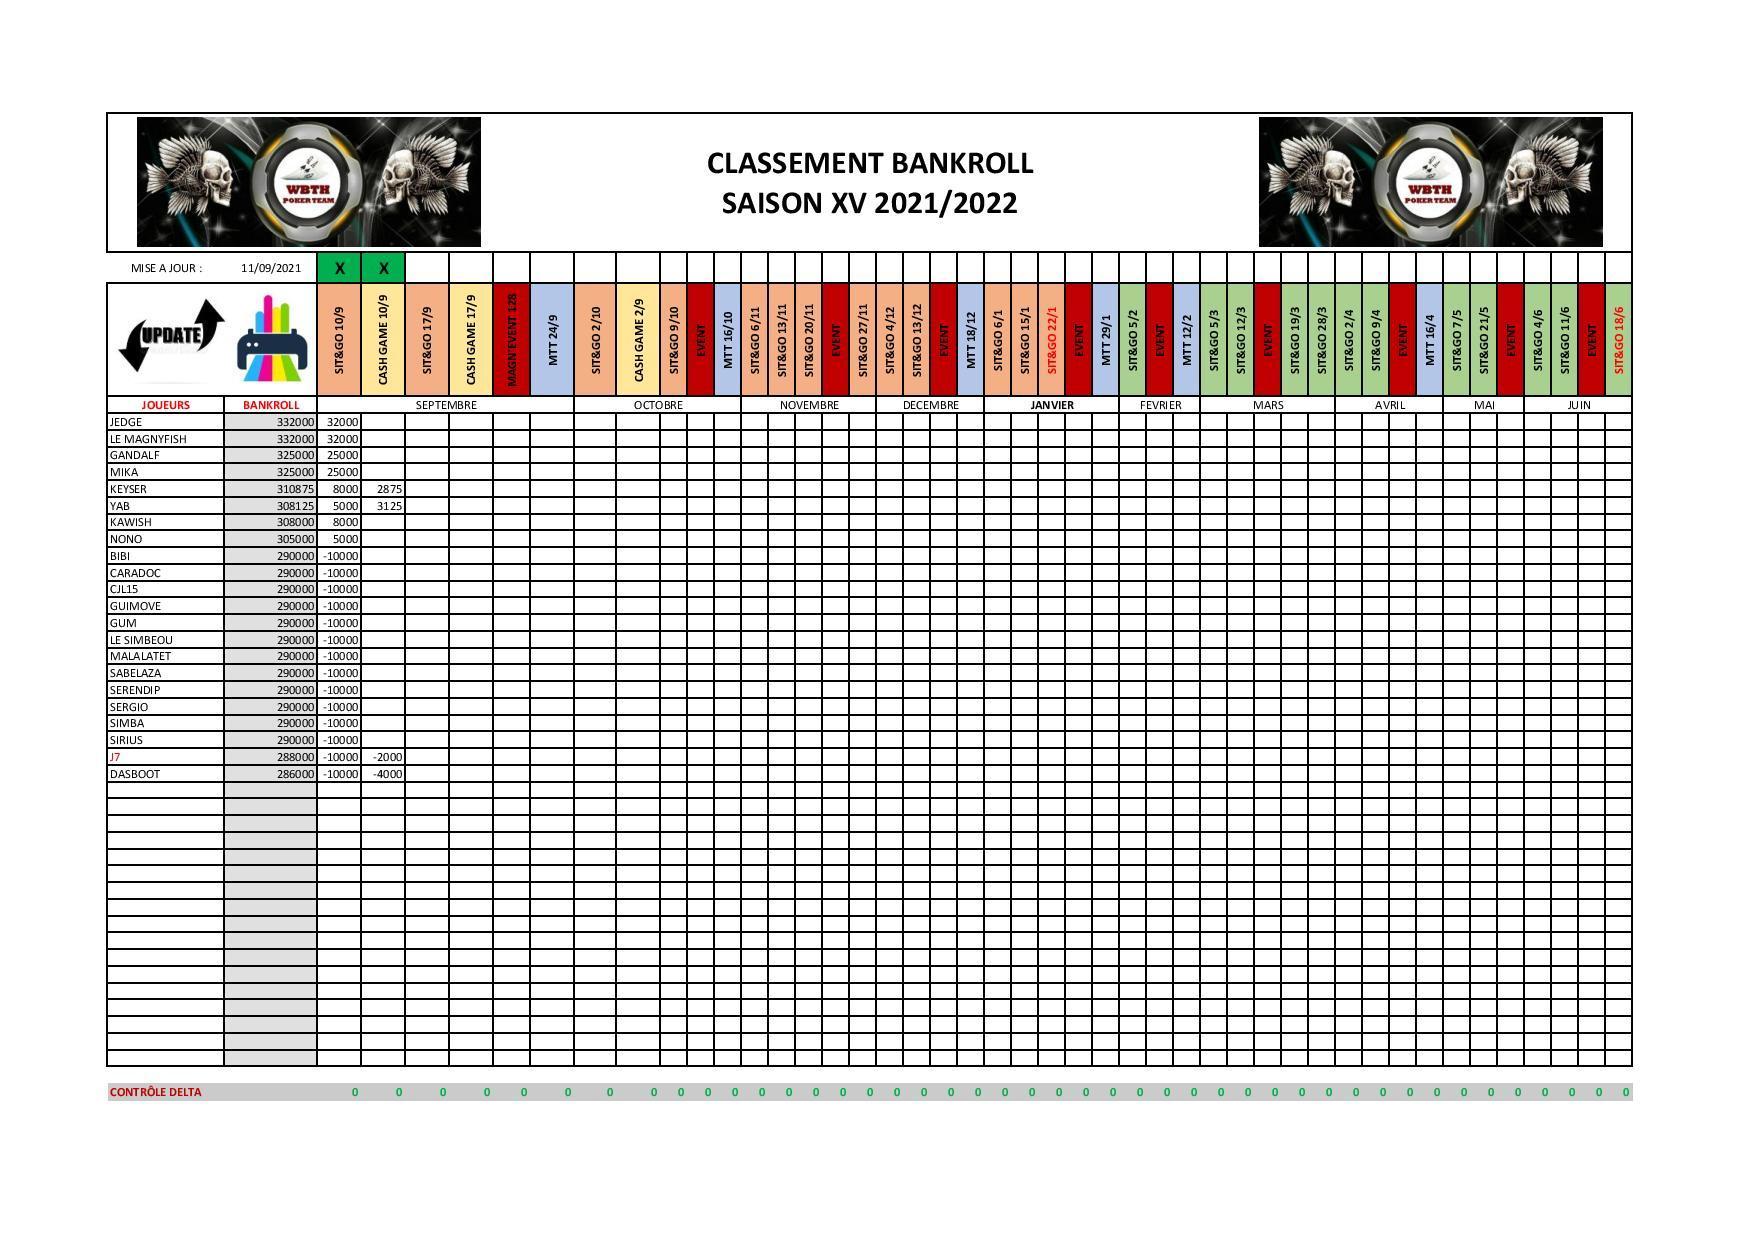 Classements saison xv 2021 2022 wbth pdf page 001